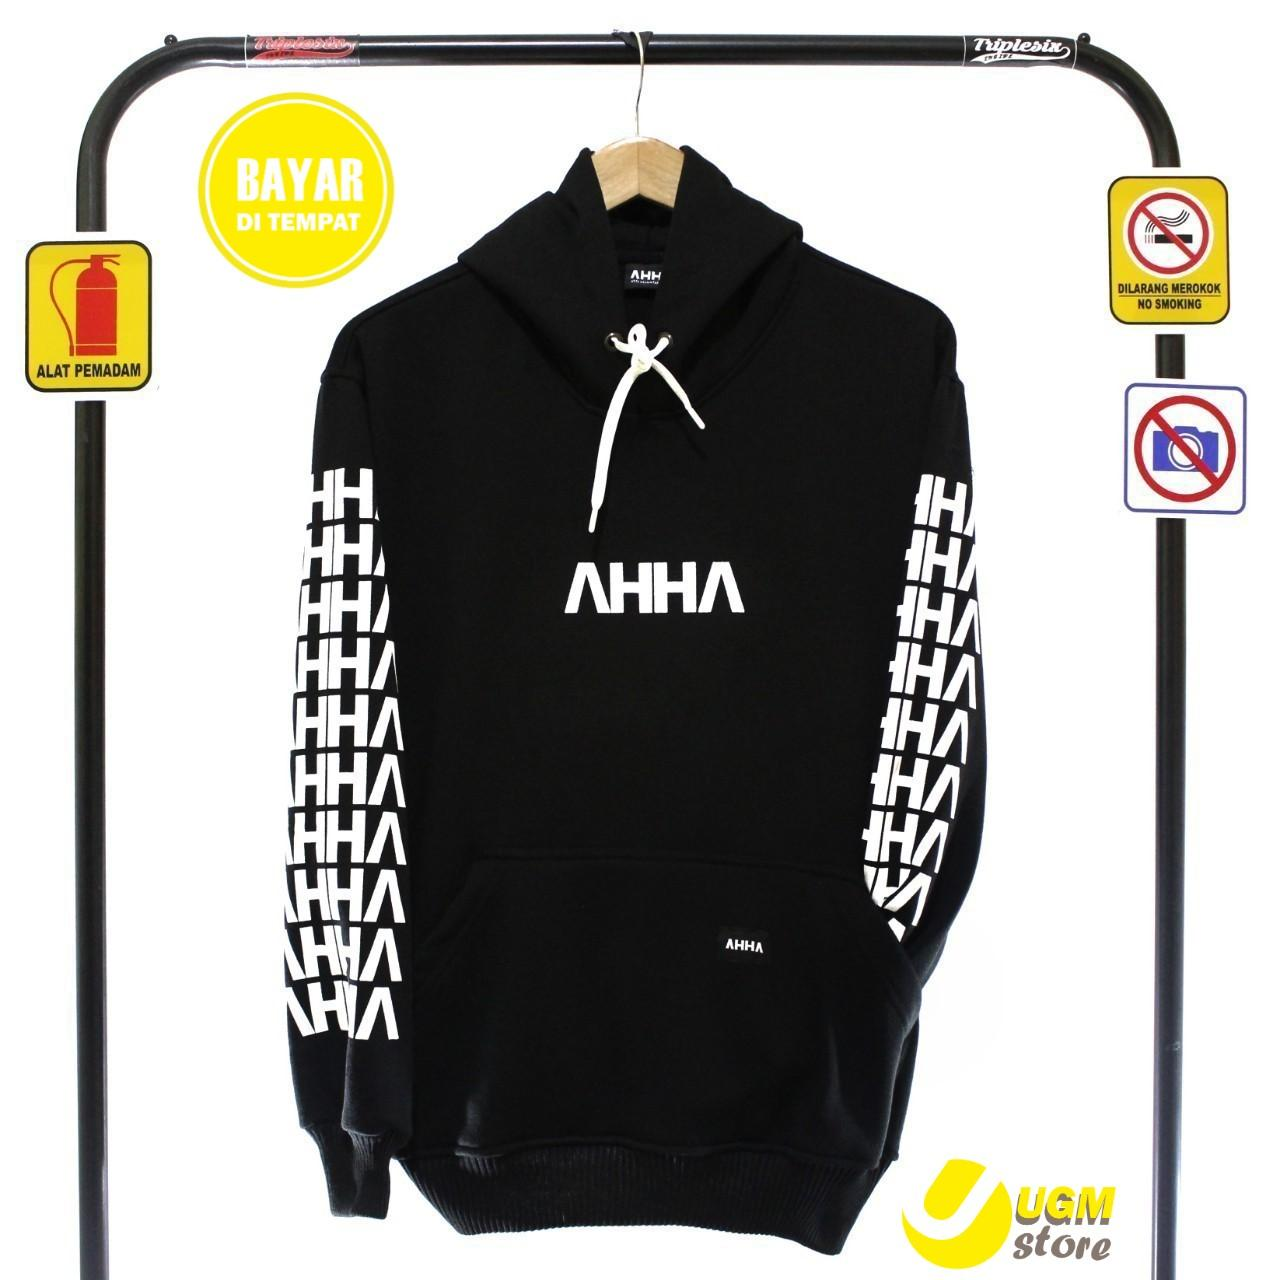 Jaket Sweater Pria   Jaket Sweater Hoodie AHHA Pria  jaket Terbaru  Jaket  Keren Pria fc1501d327